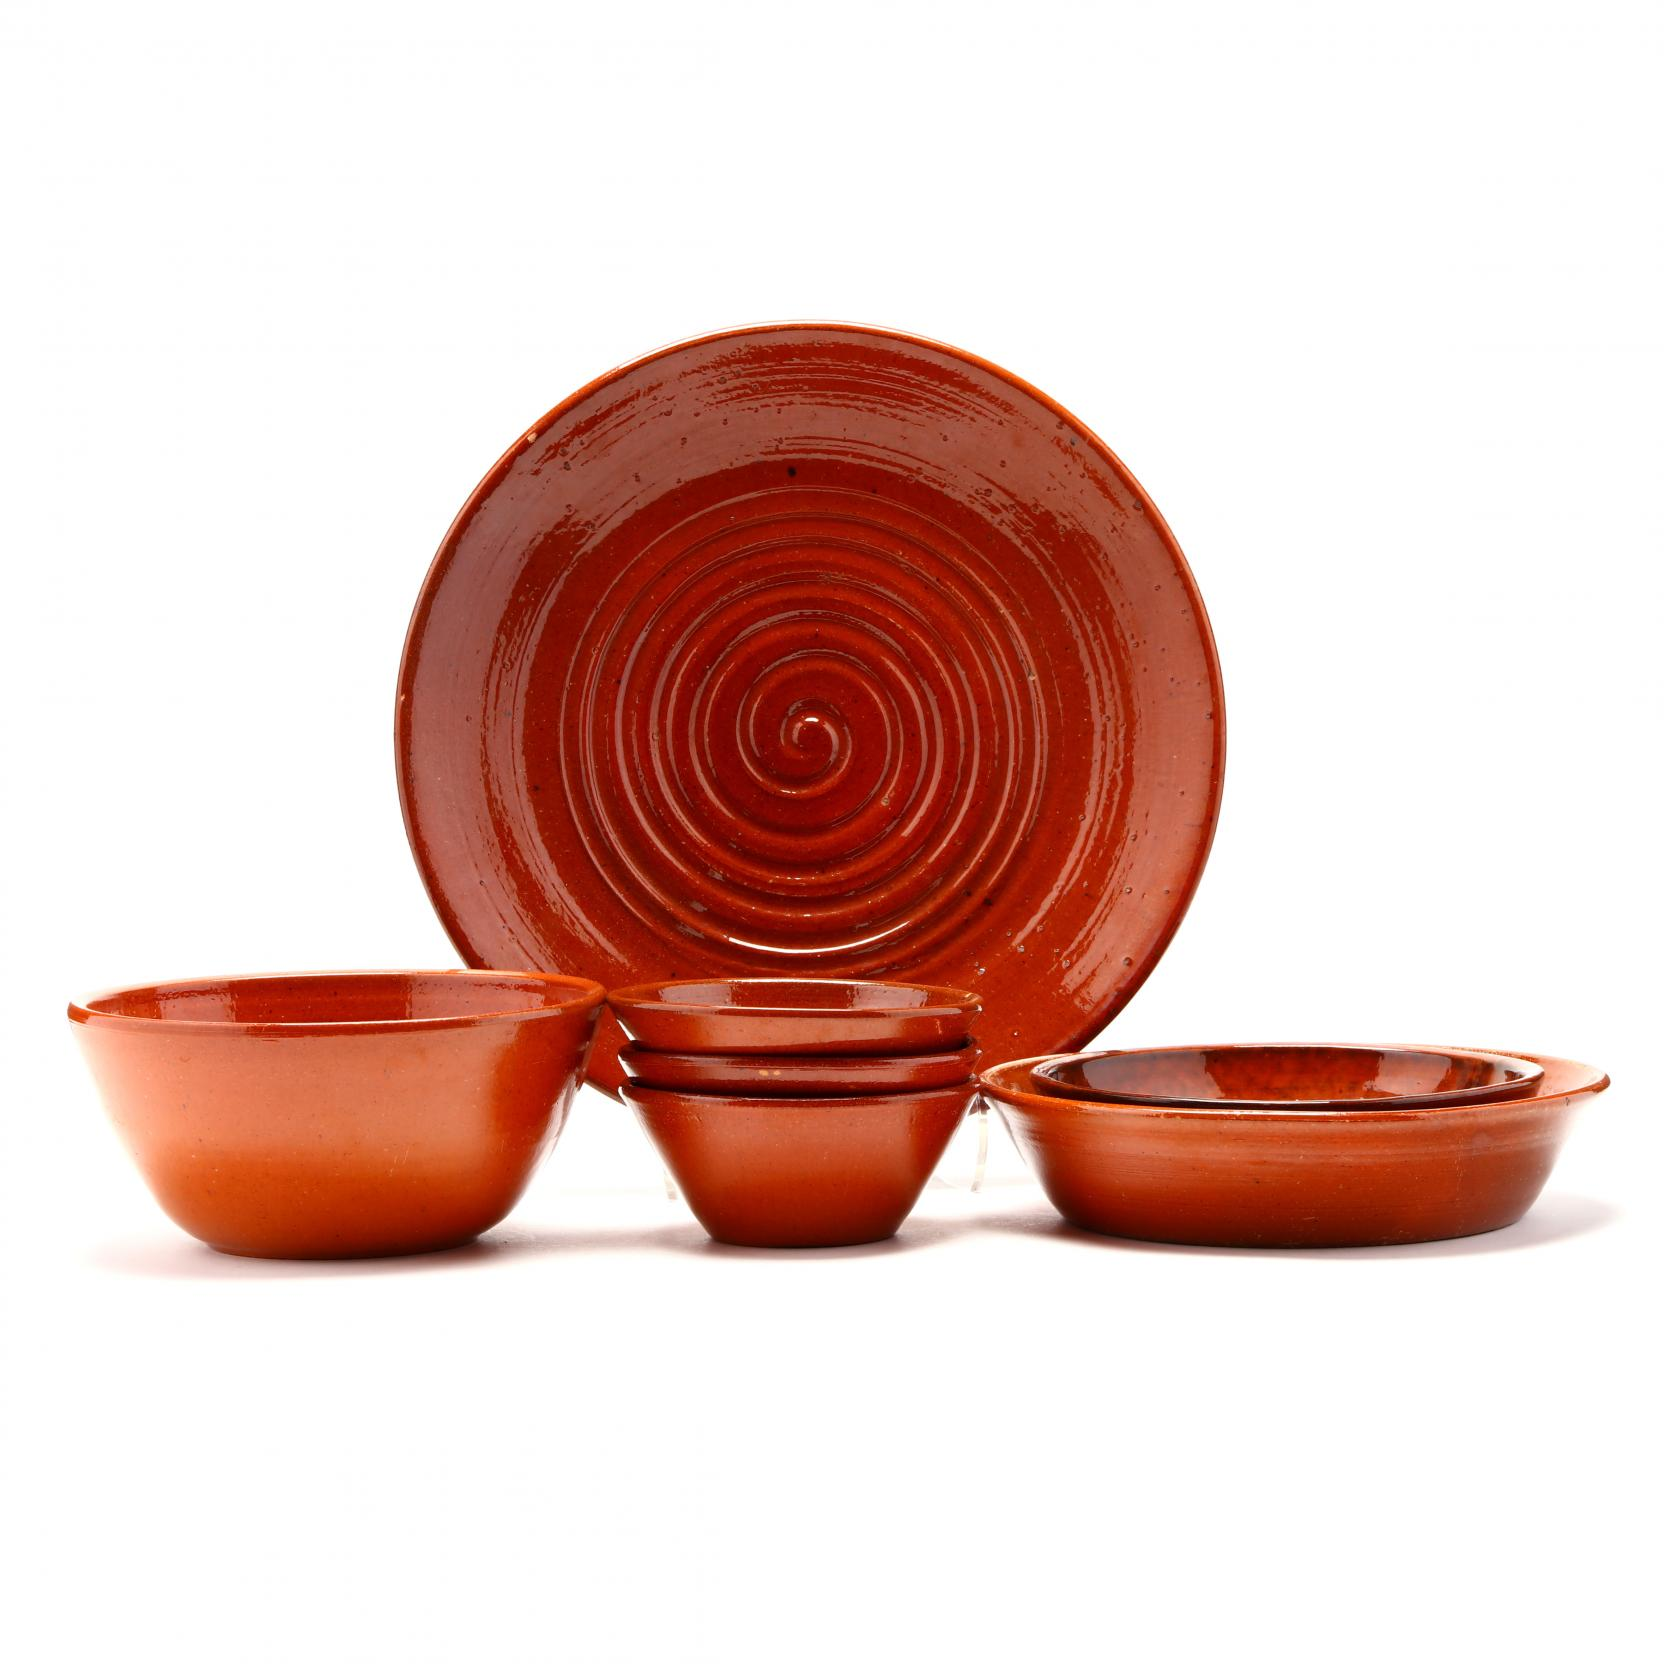 ben-owen-master-potter-serving-pieces